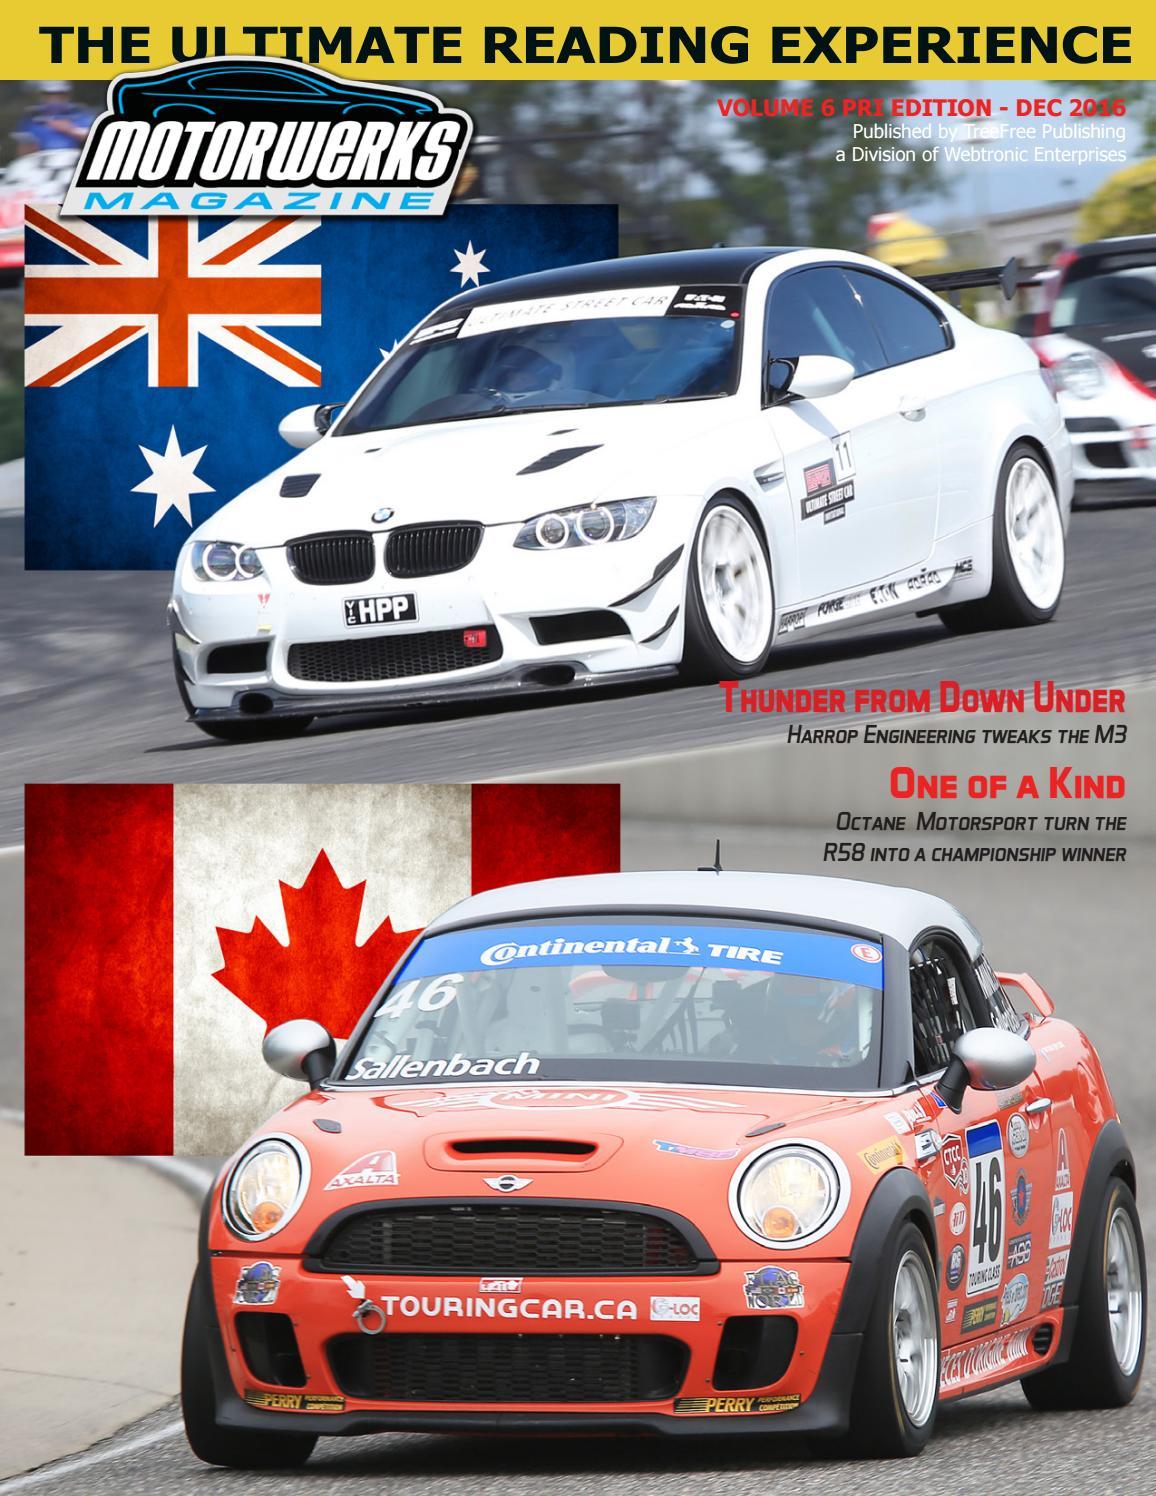 2016 PRI Edition by MotorWerks Magazine - issuu